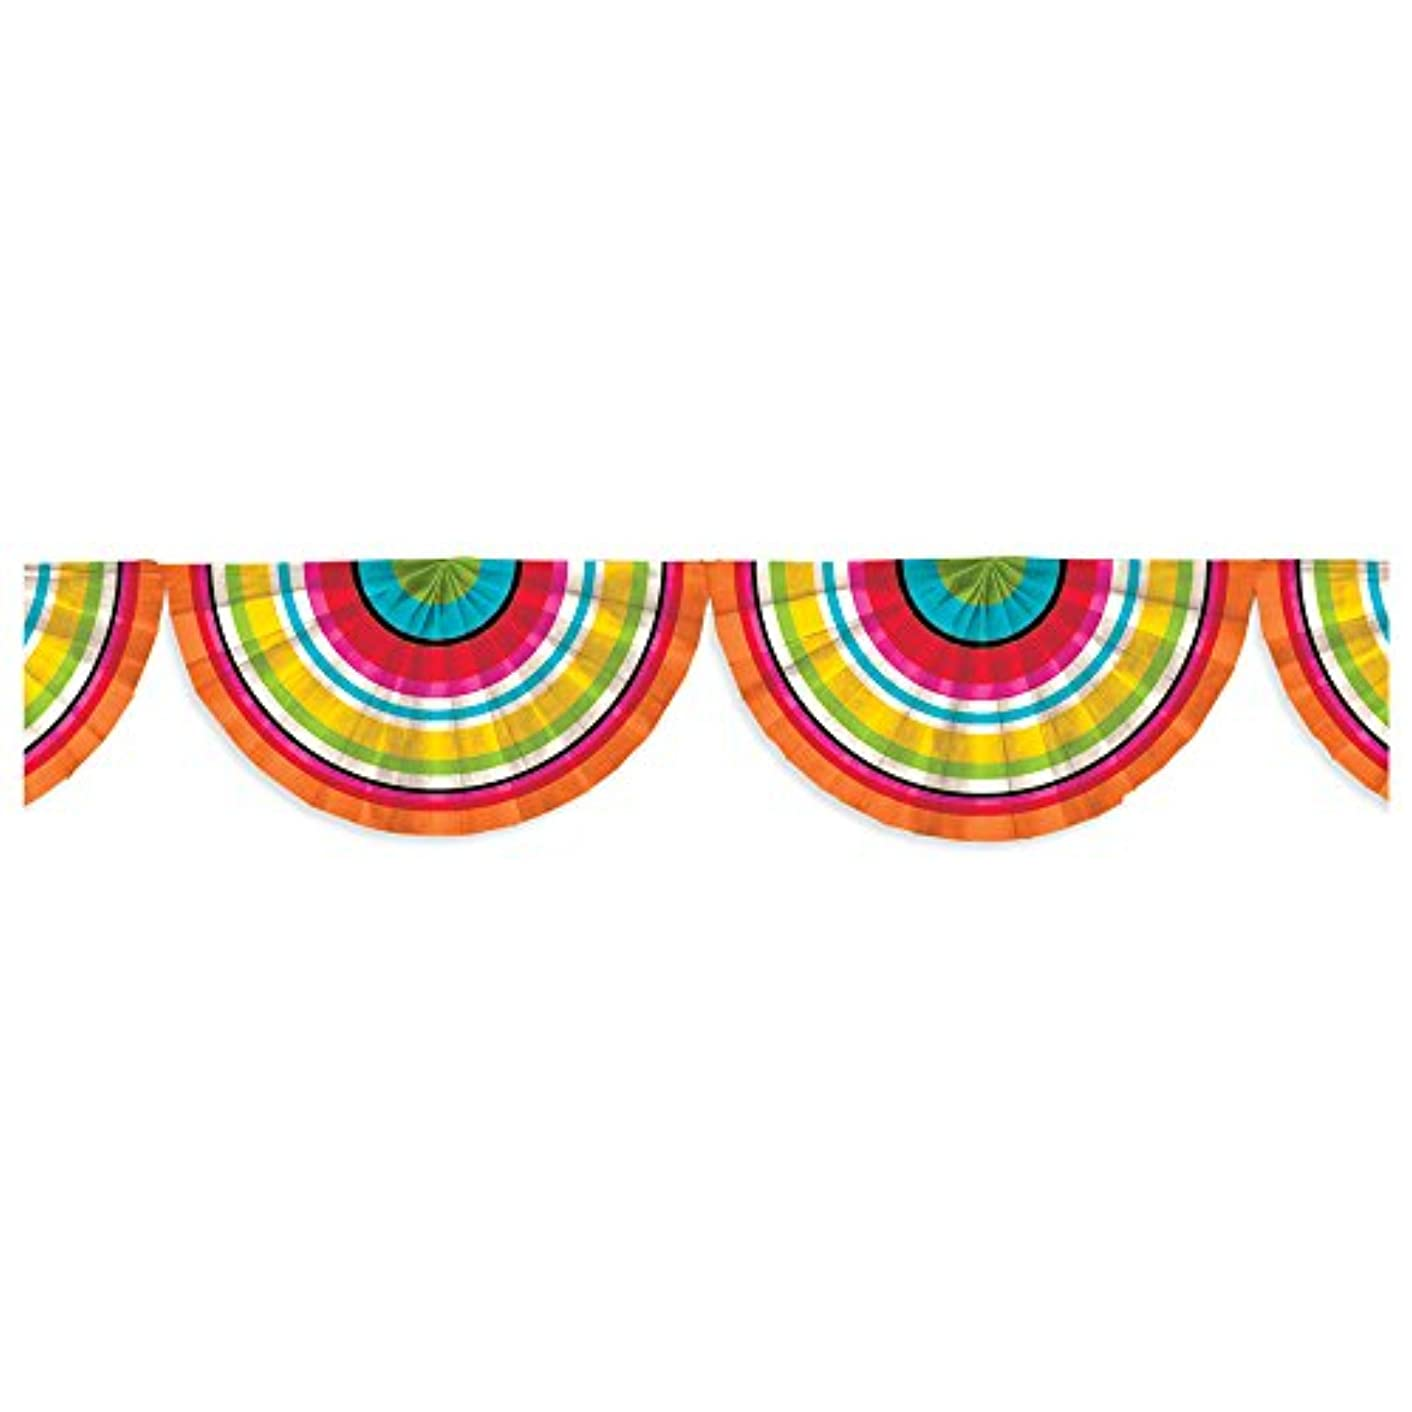 Amscan 220348 Serape Bunting Garland 9' Multicolor